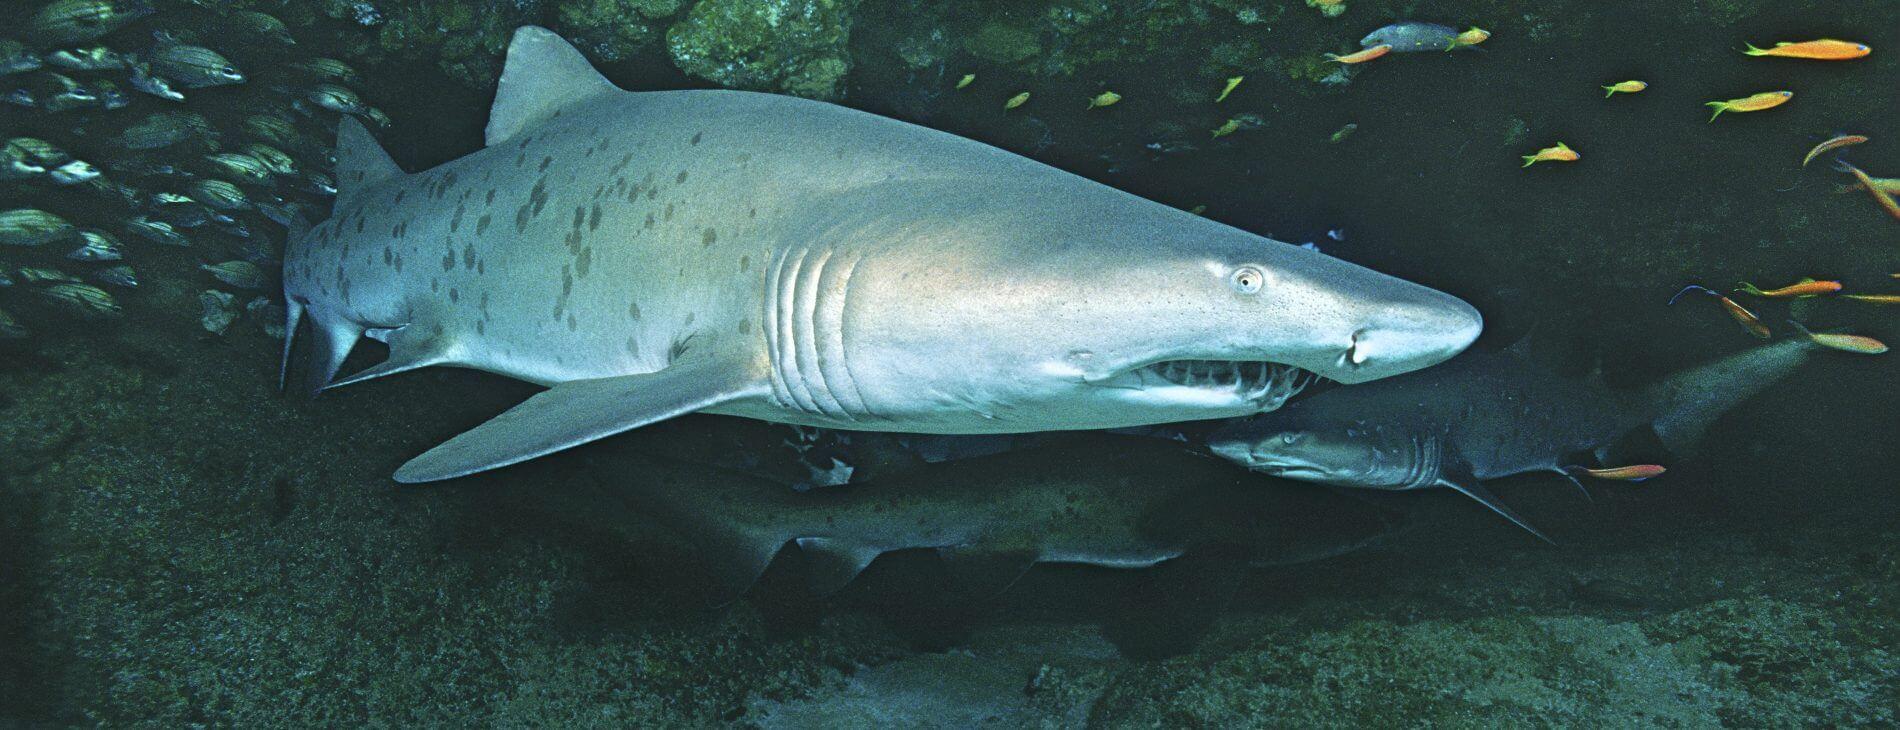 Mastroviaggiatore Sudafrica - Raggy Shark